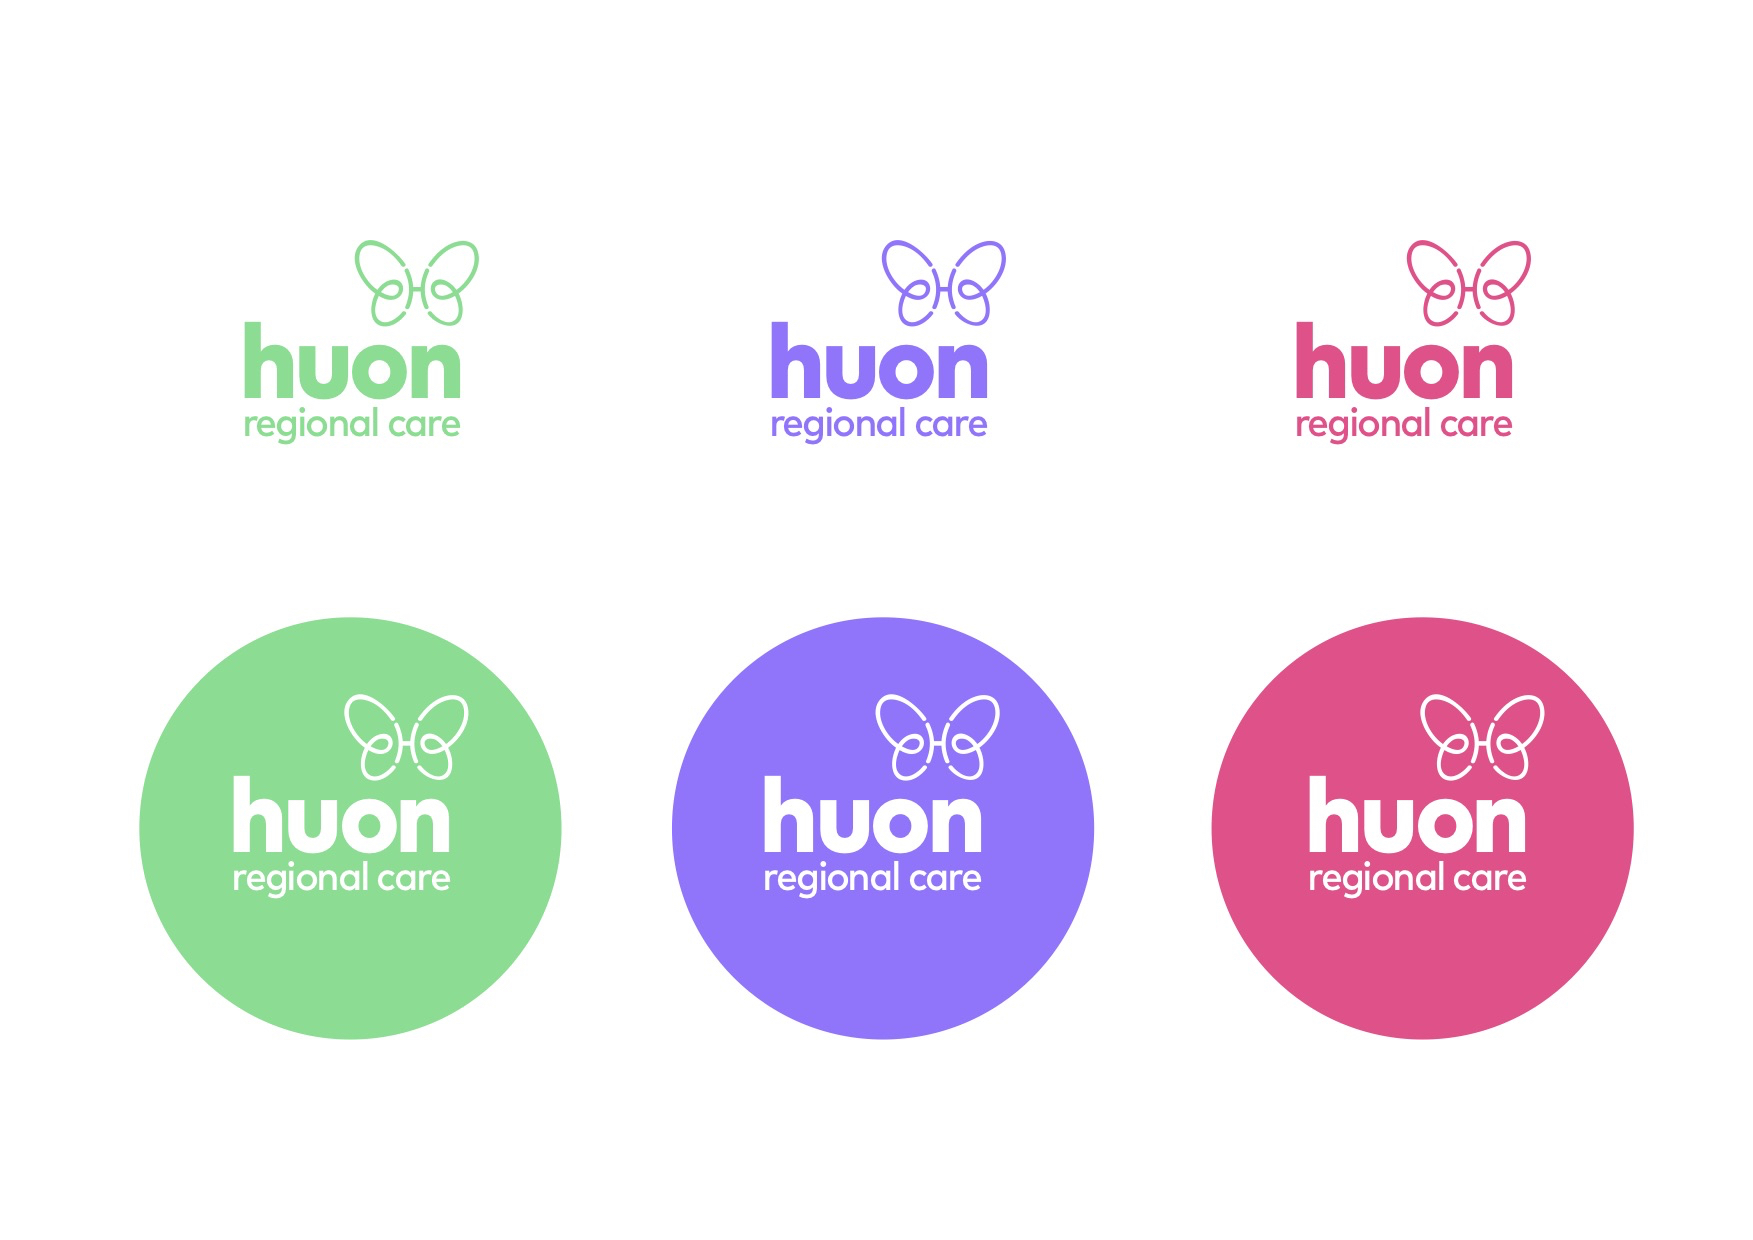 Huon Regional Care launches new rebrand, TV spot and content series via Common Ventures